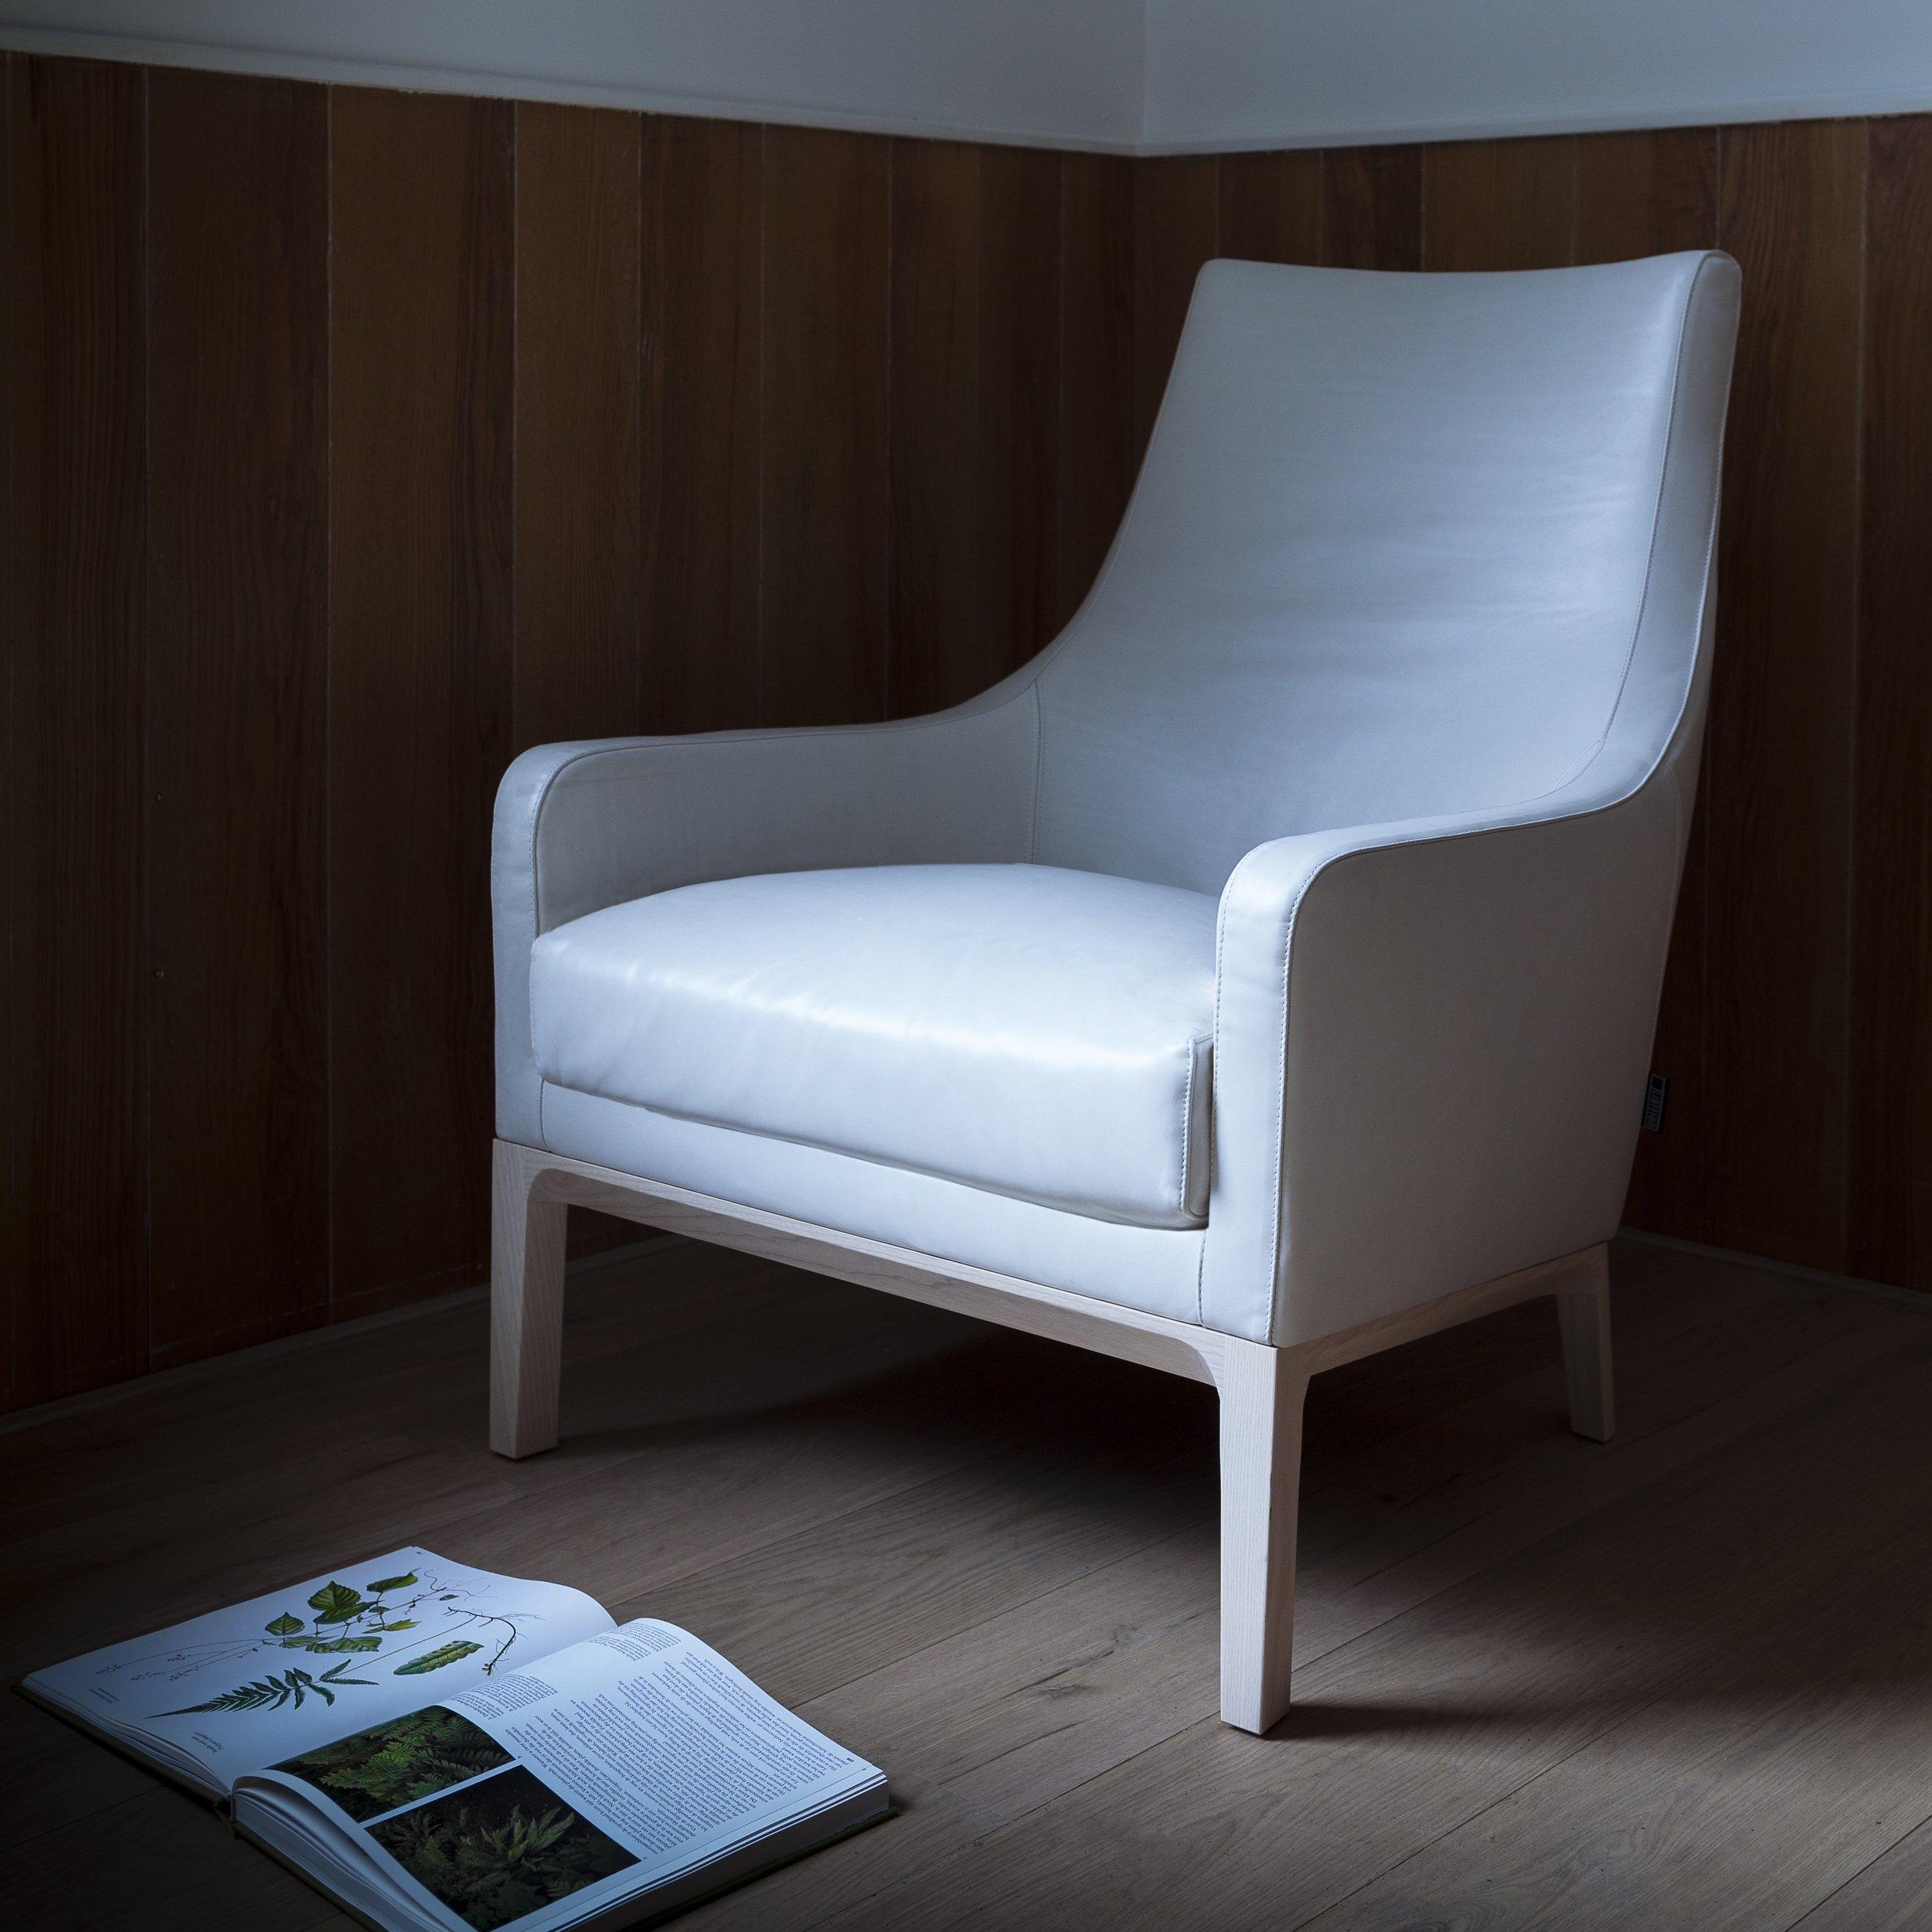 LINTELOO Miles High Chair